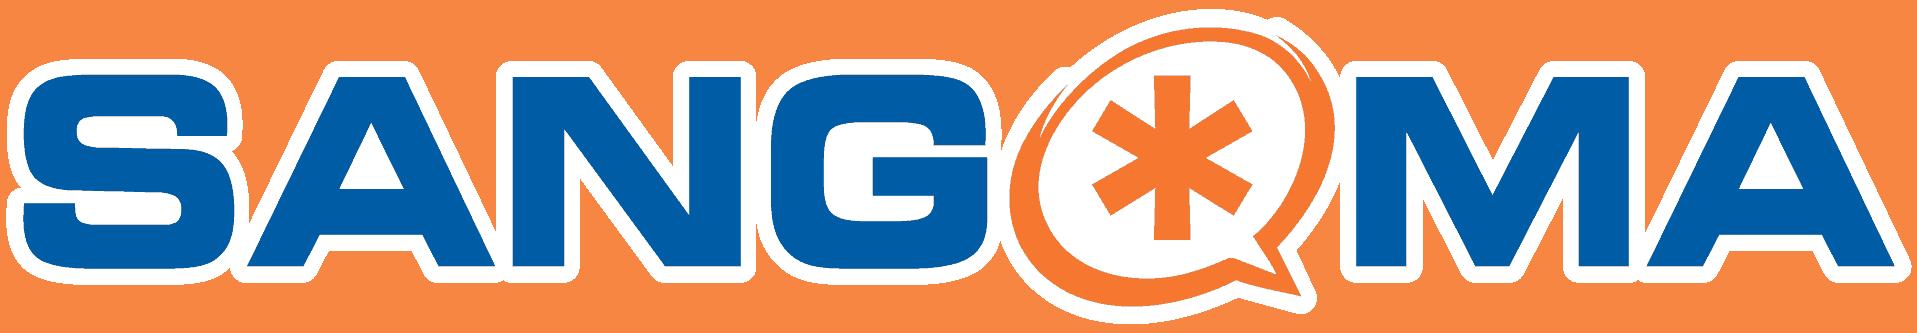 Sangoma Logo White Outline Bak8c1